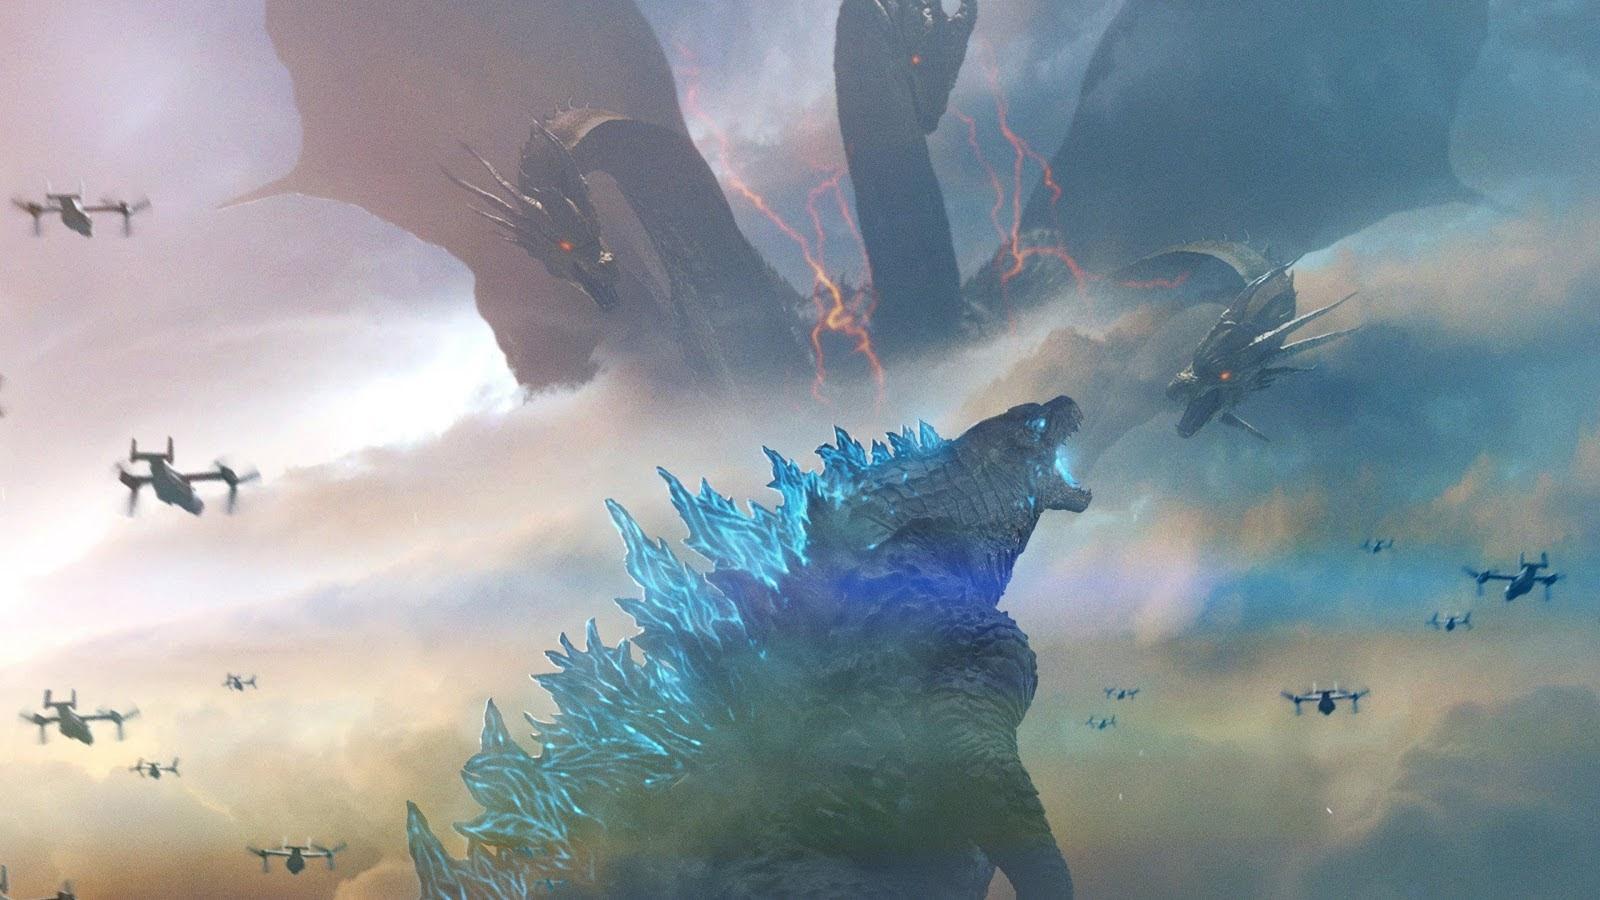 Godzilla vs. King Ghidorah, Godzilla: King of the Monsters ...